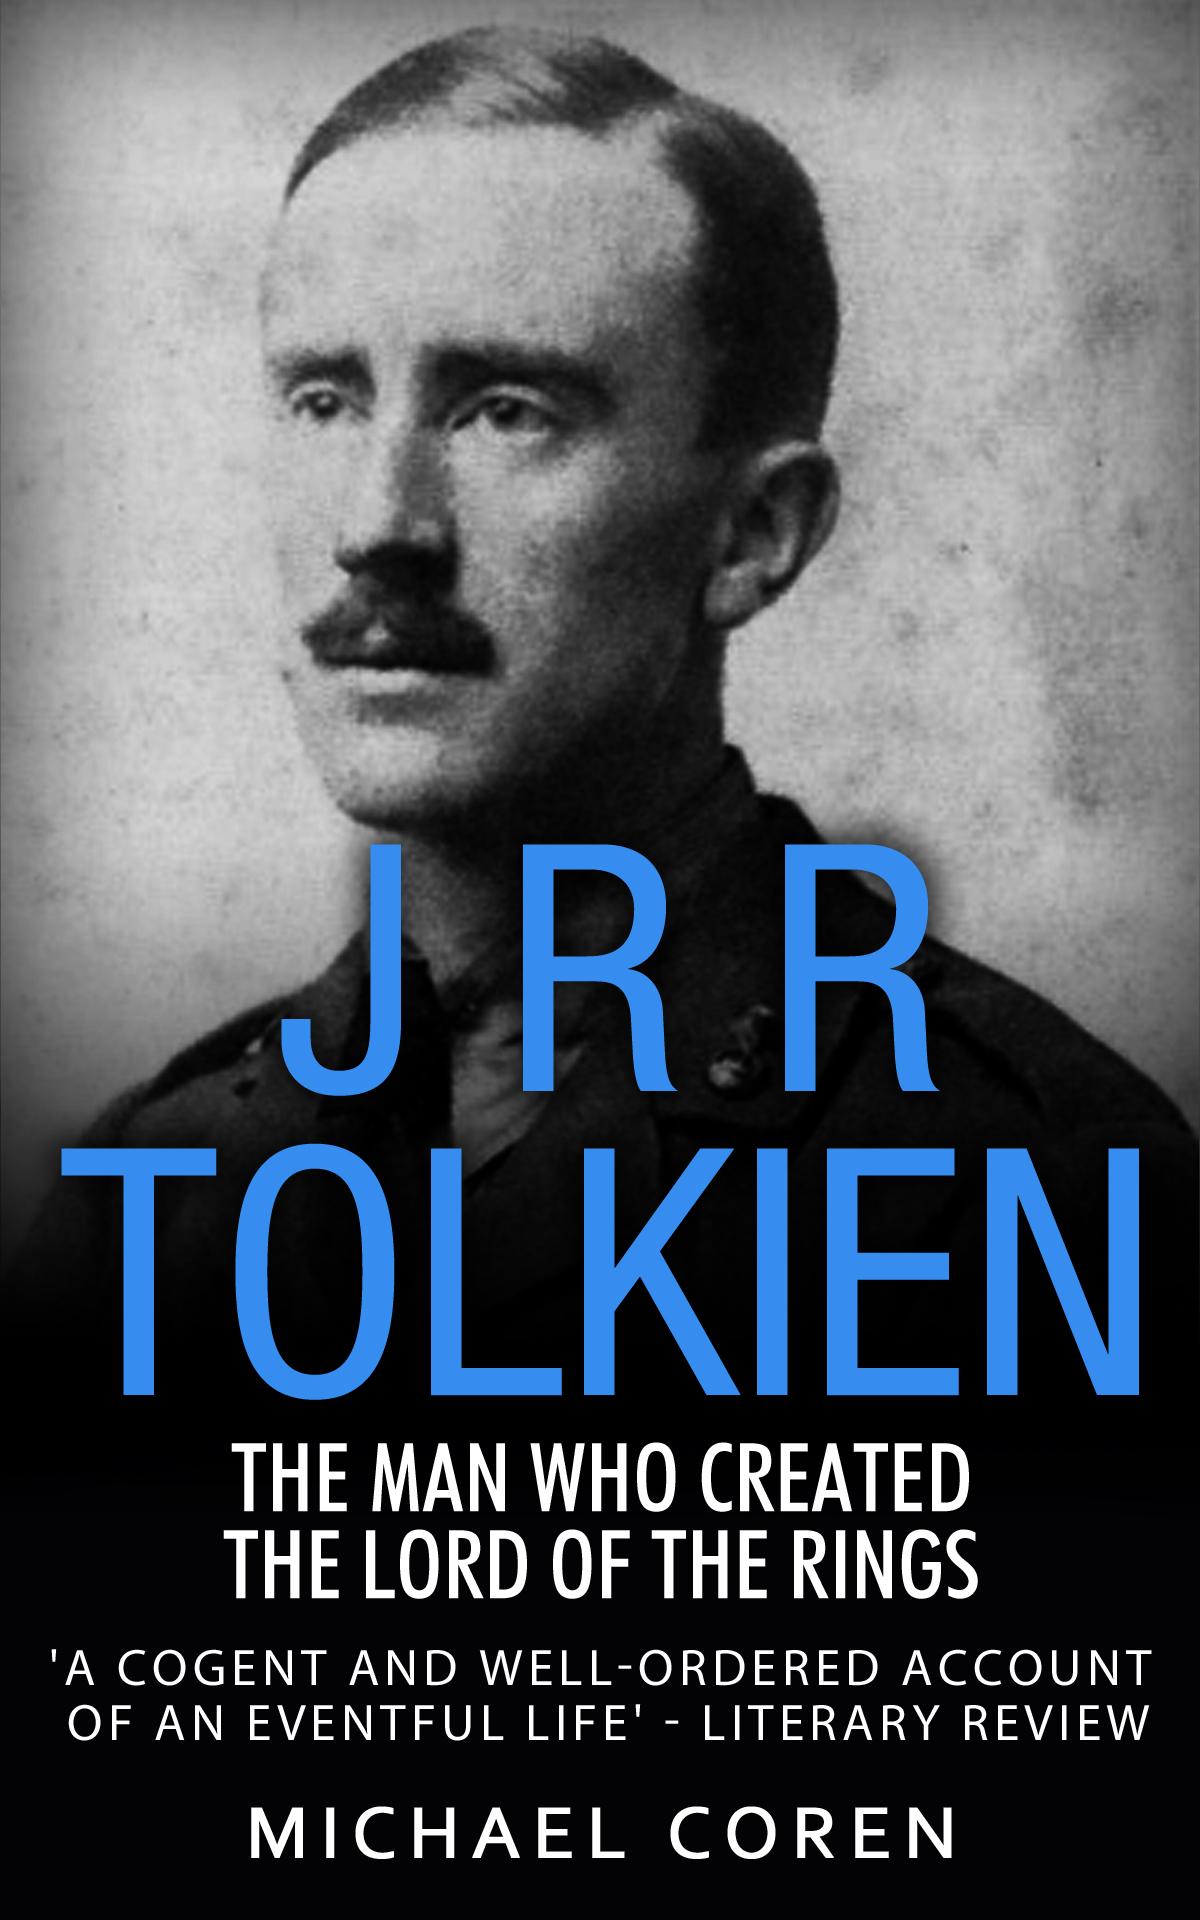 J. R. R. Tolkien Michael Coren